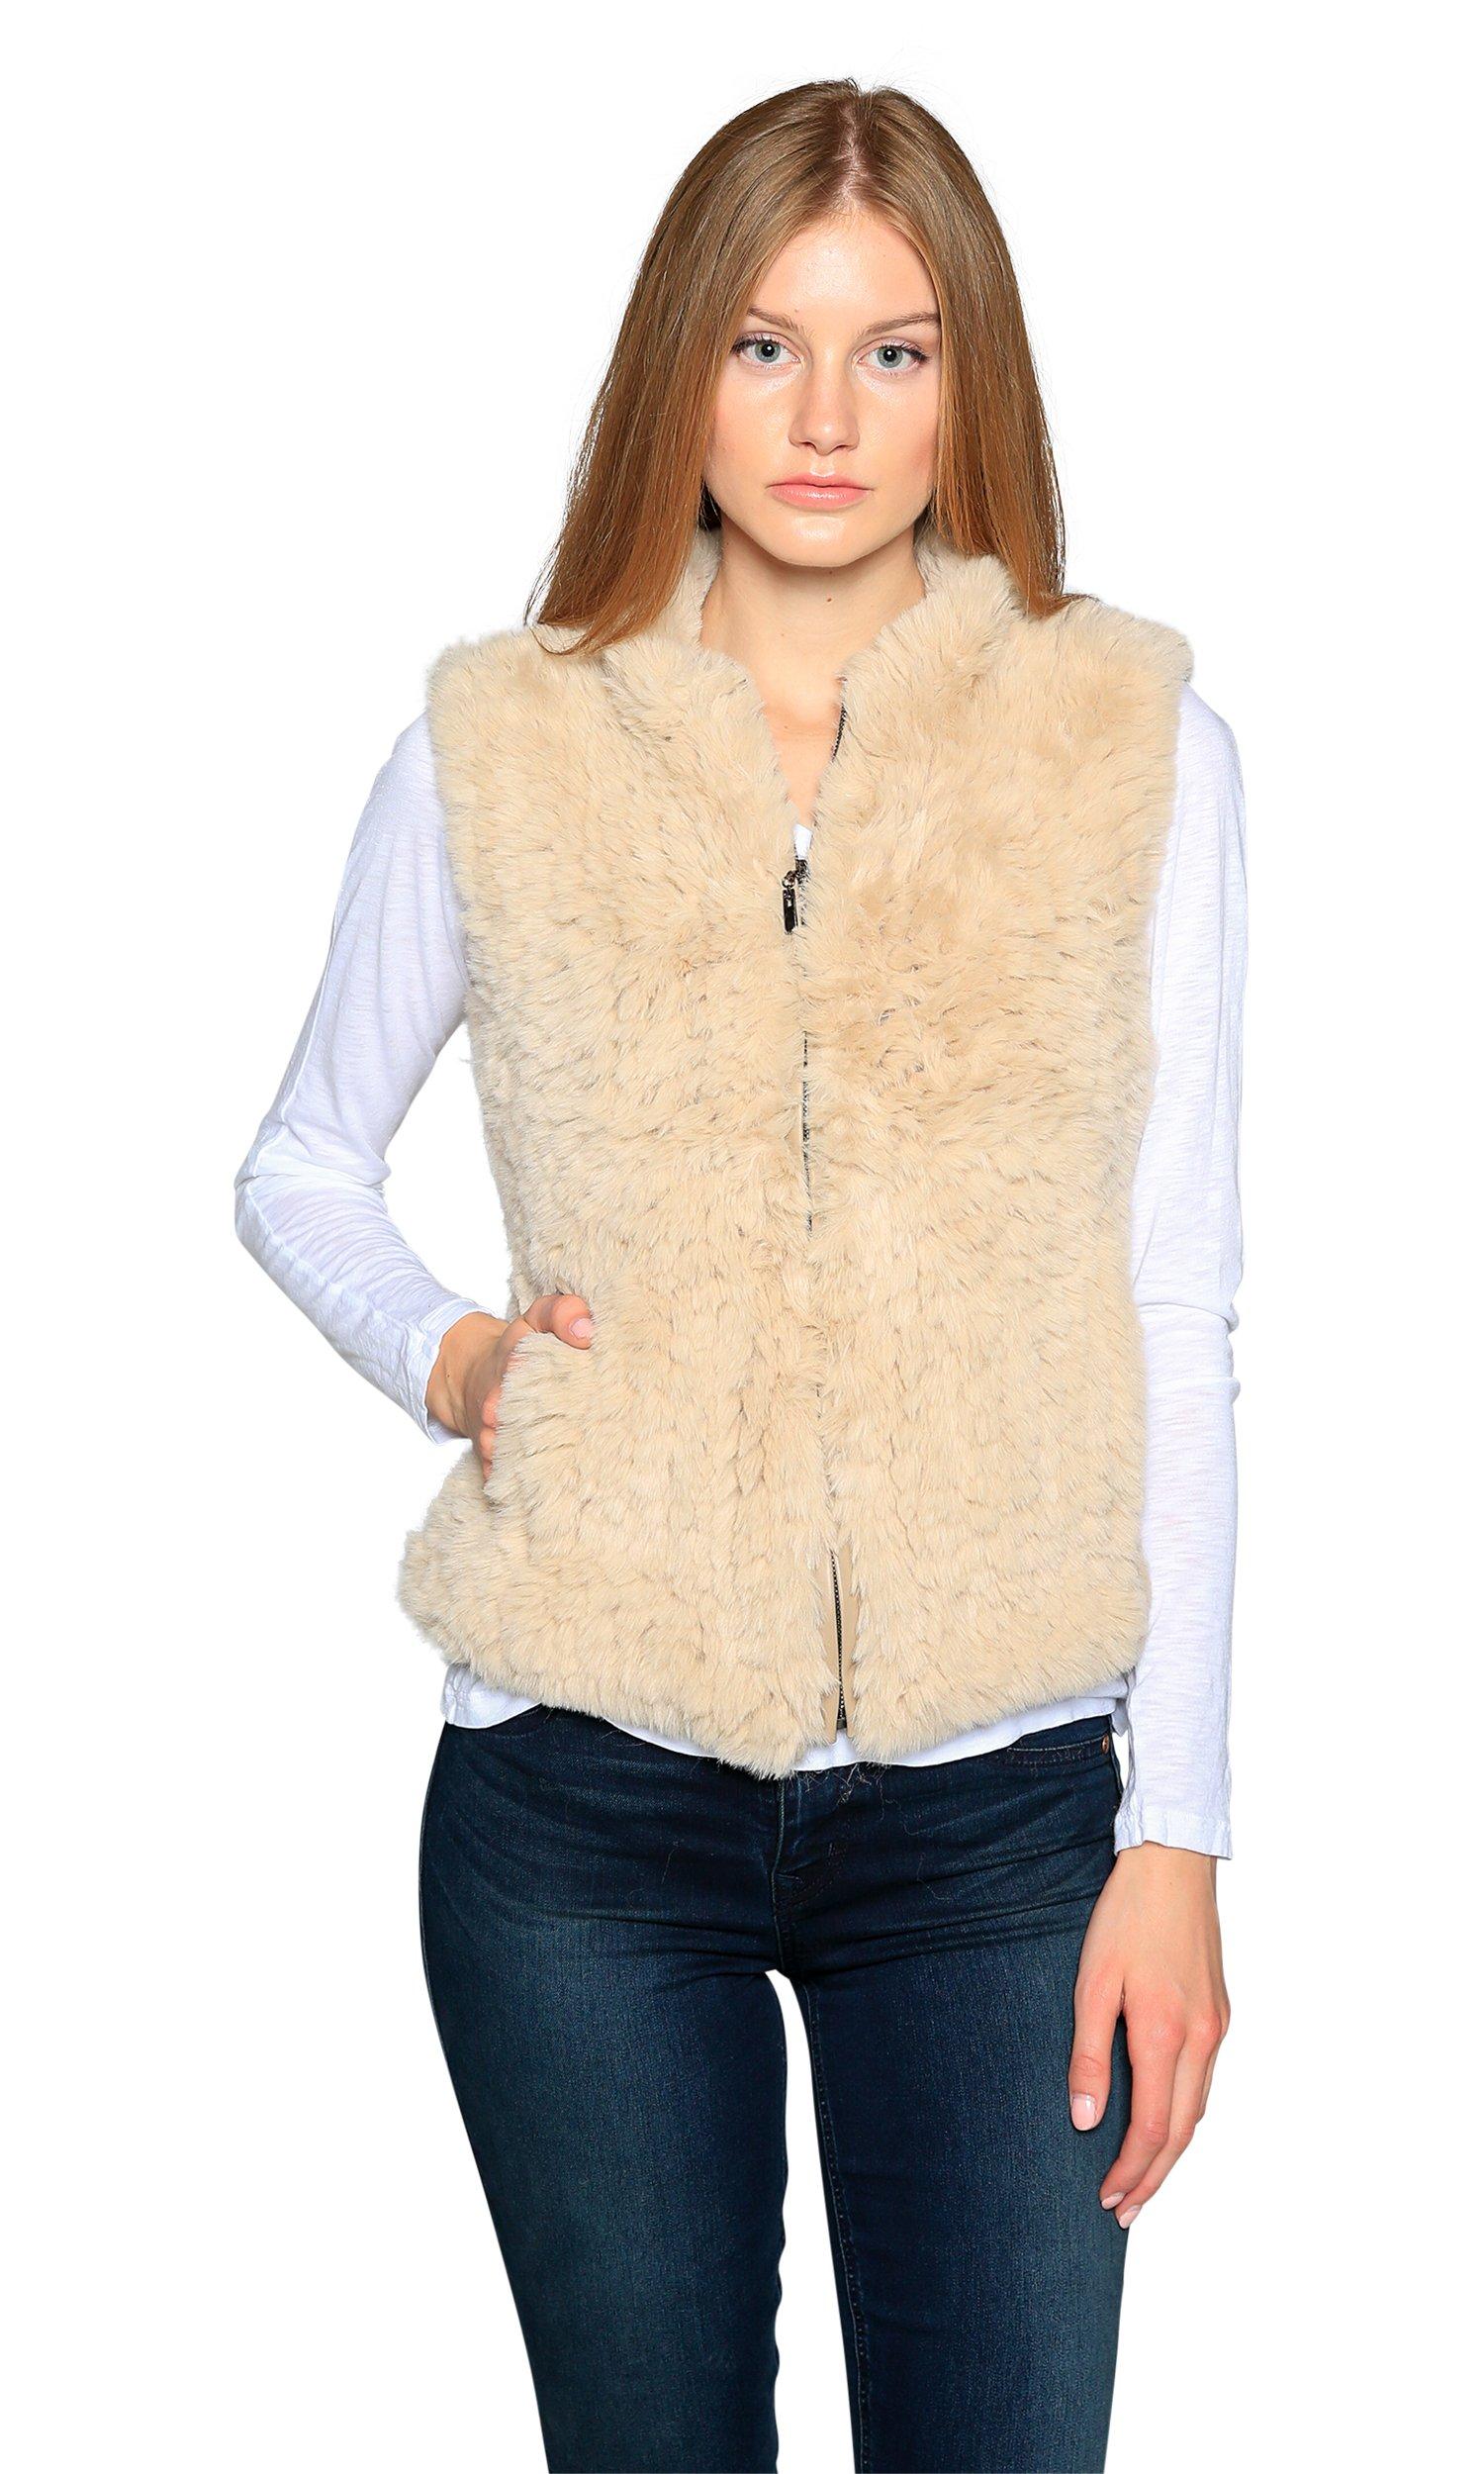 Love Token Ruby Zip Up Faux Fur Vest, Beige, M